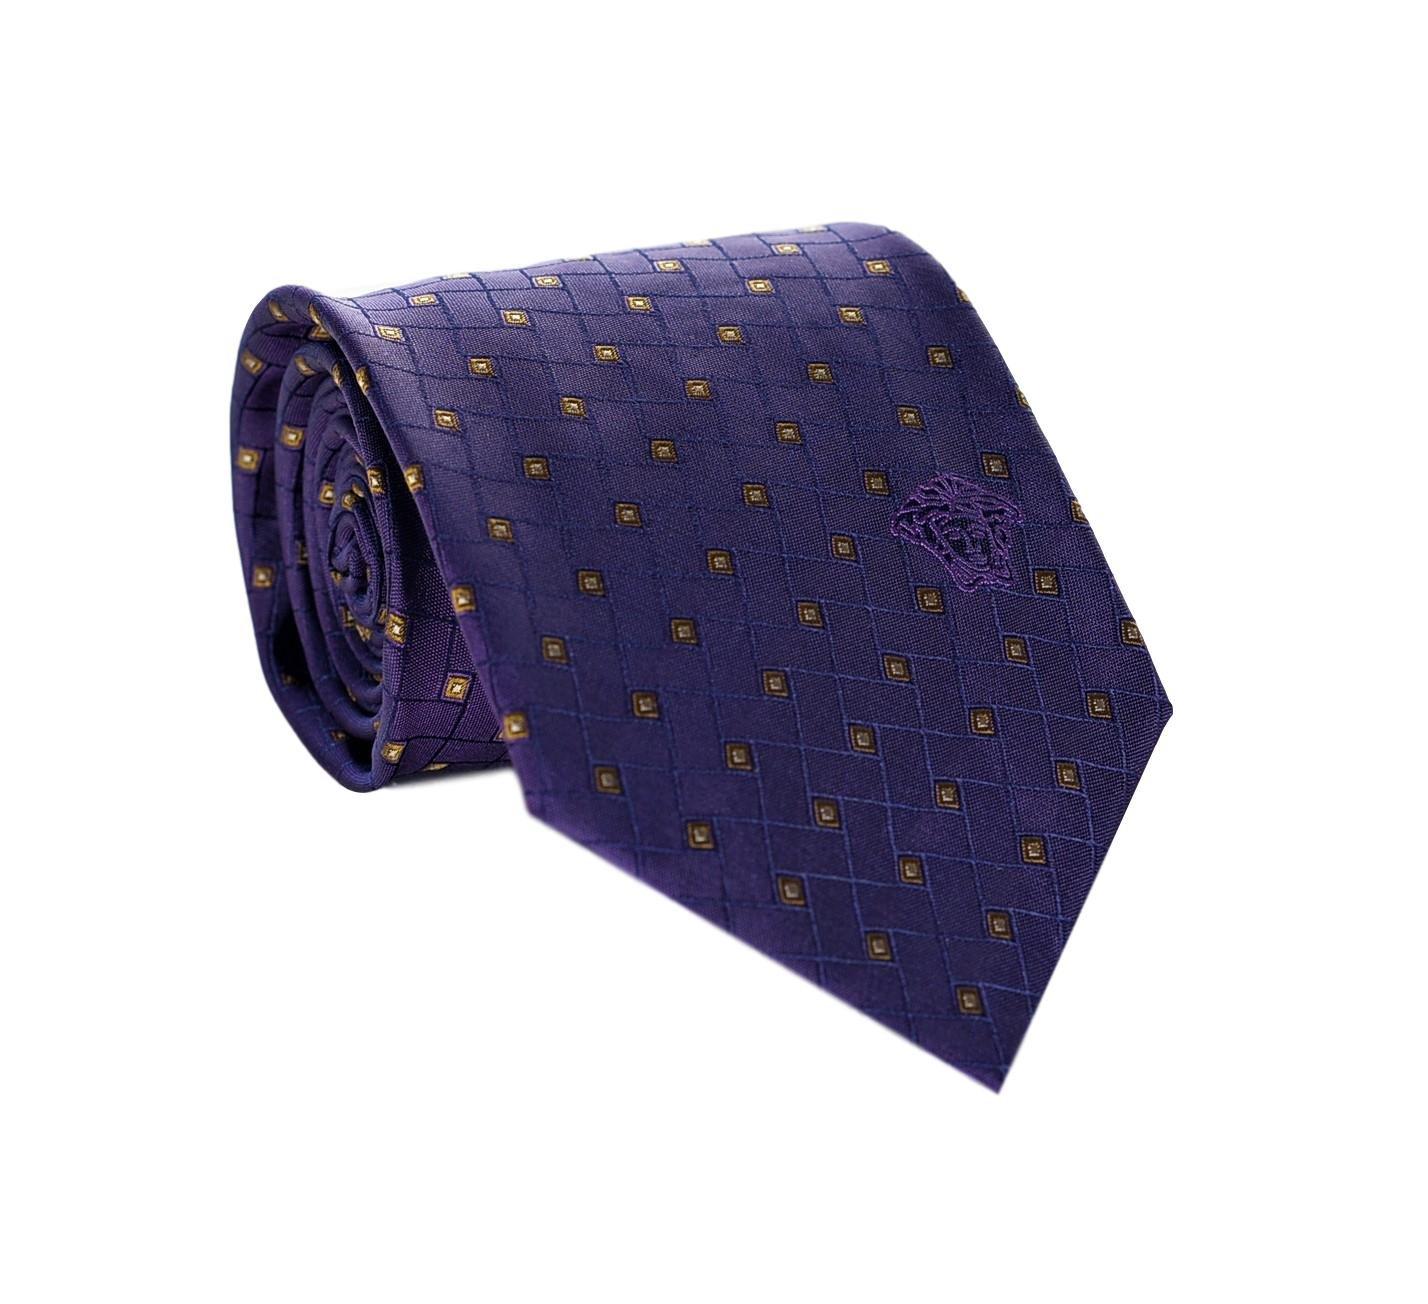 Versace Men's Geometrical Square Patterned Silk Necktie Purple